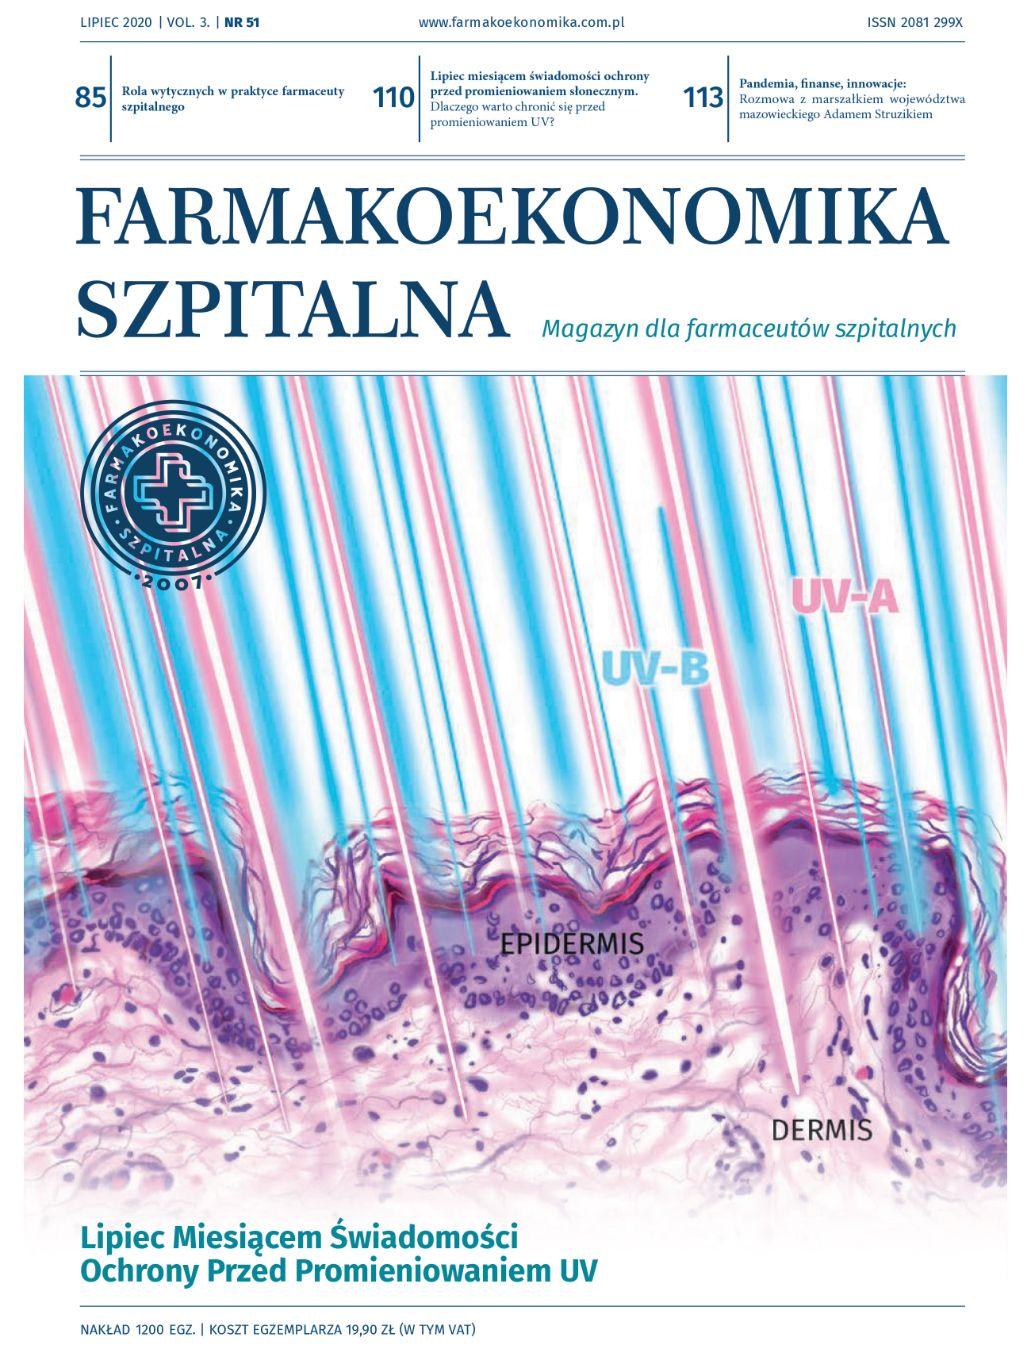 faramaekonomika nr51 okładka2 1 - Magazyn